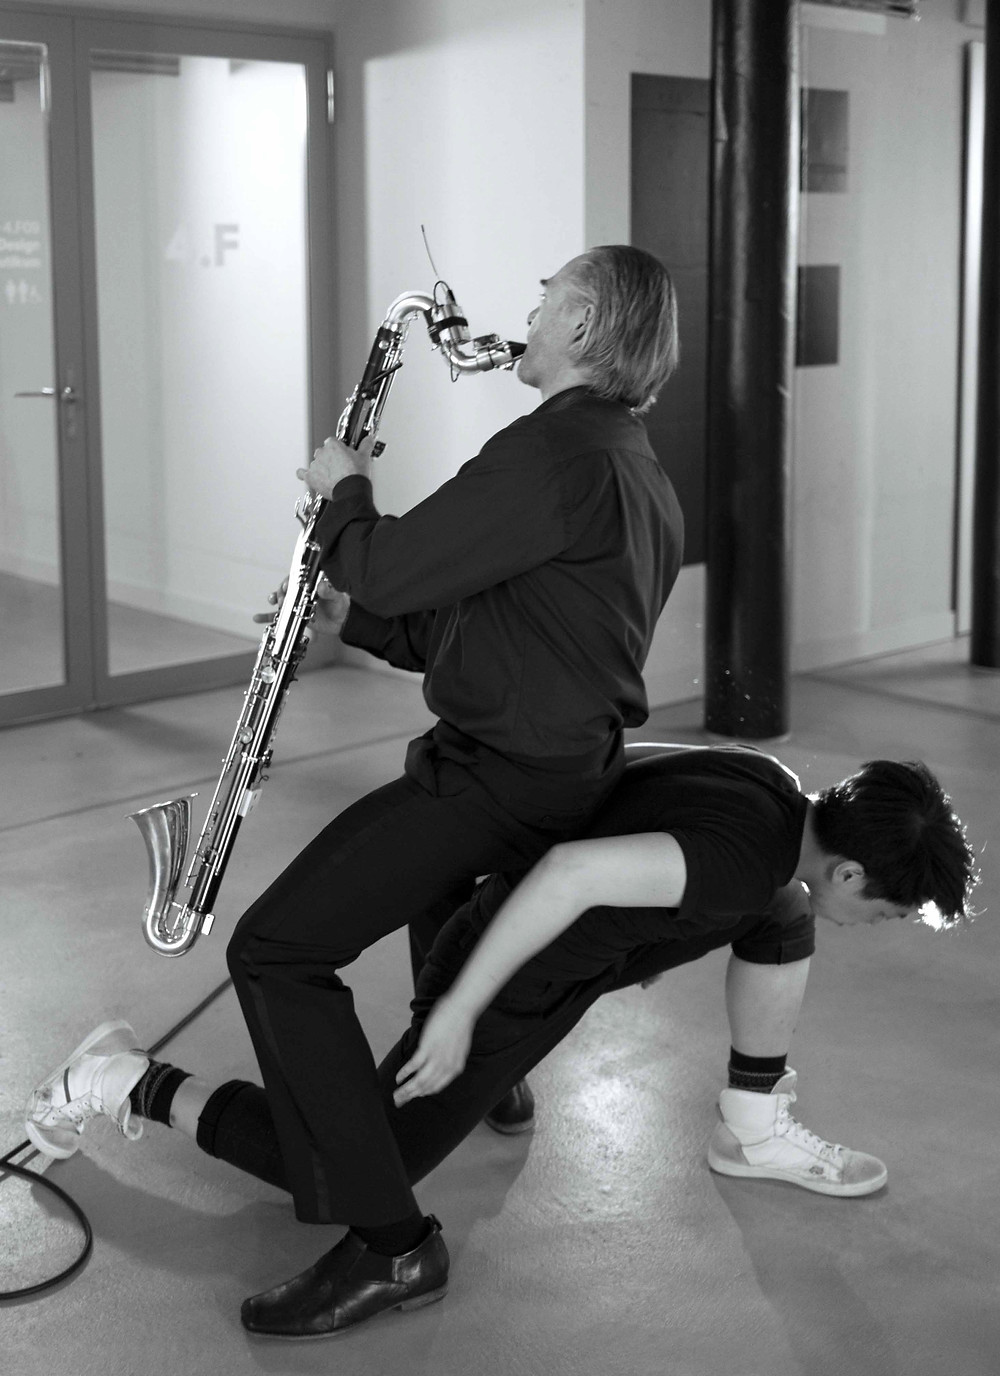 Odd Couplings Choreographer: Lam Chun-ho Photographer: Katja Glass